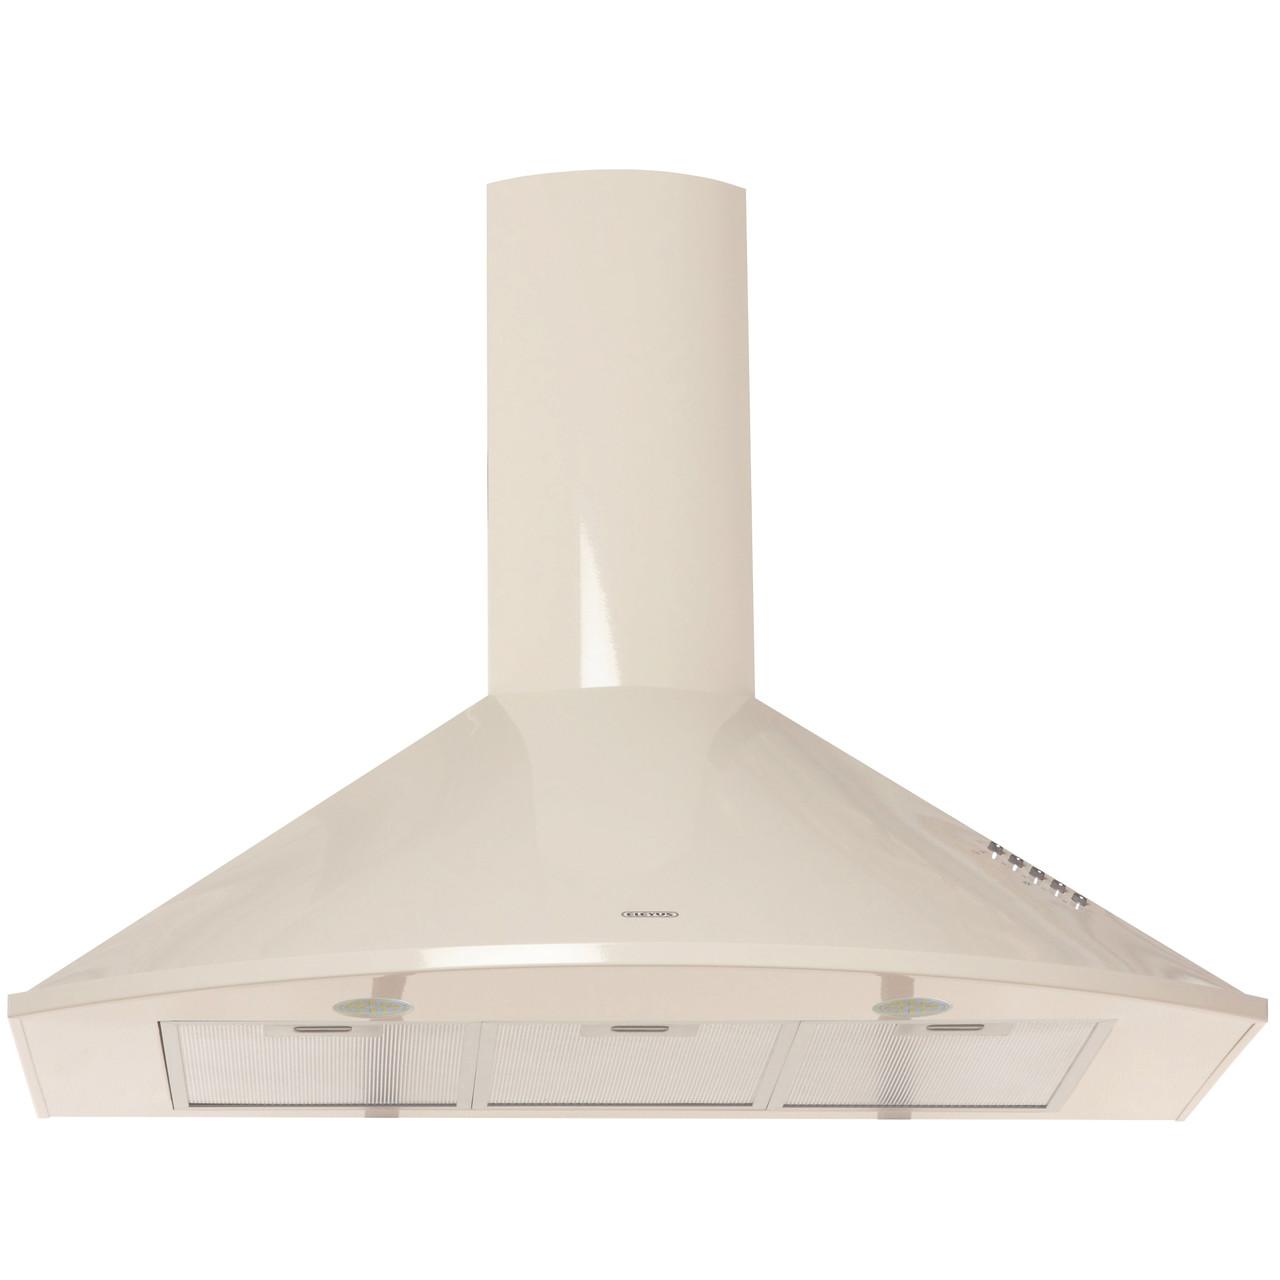 Витяжка кухонна ELEYUS Bora 1000 LED SMD 90 BG